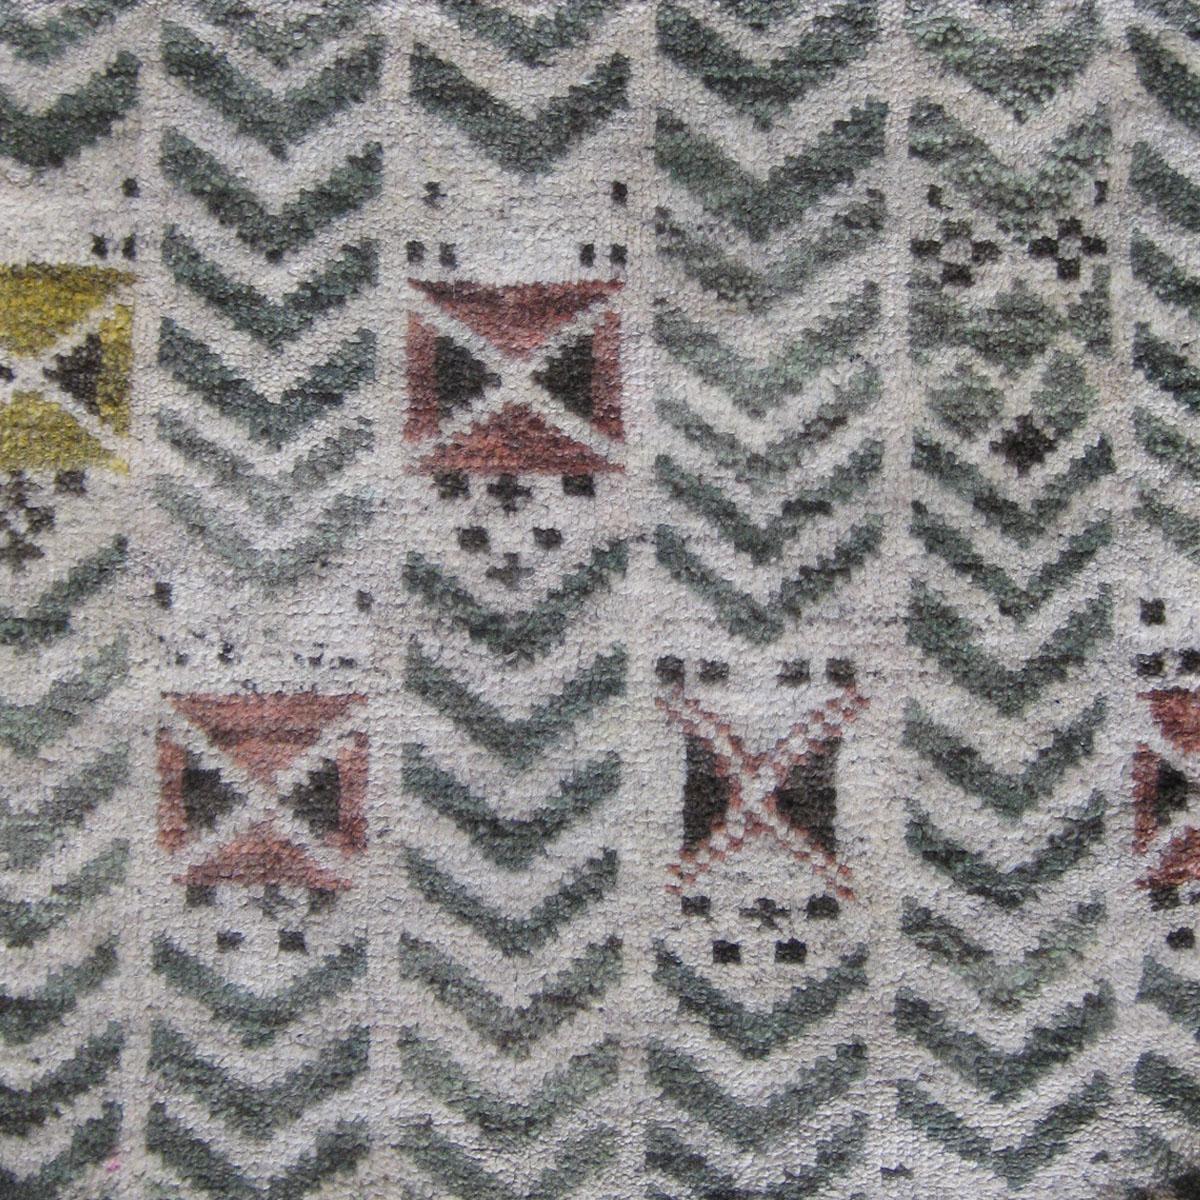 Tapestry Design N10319S